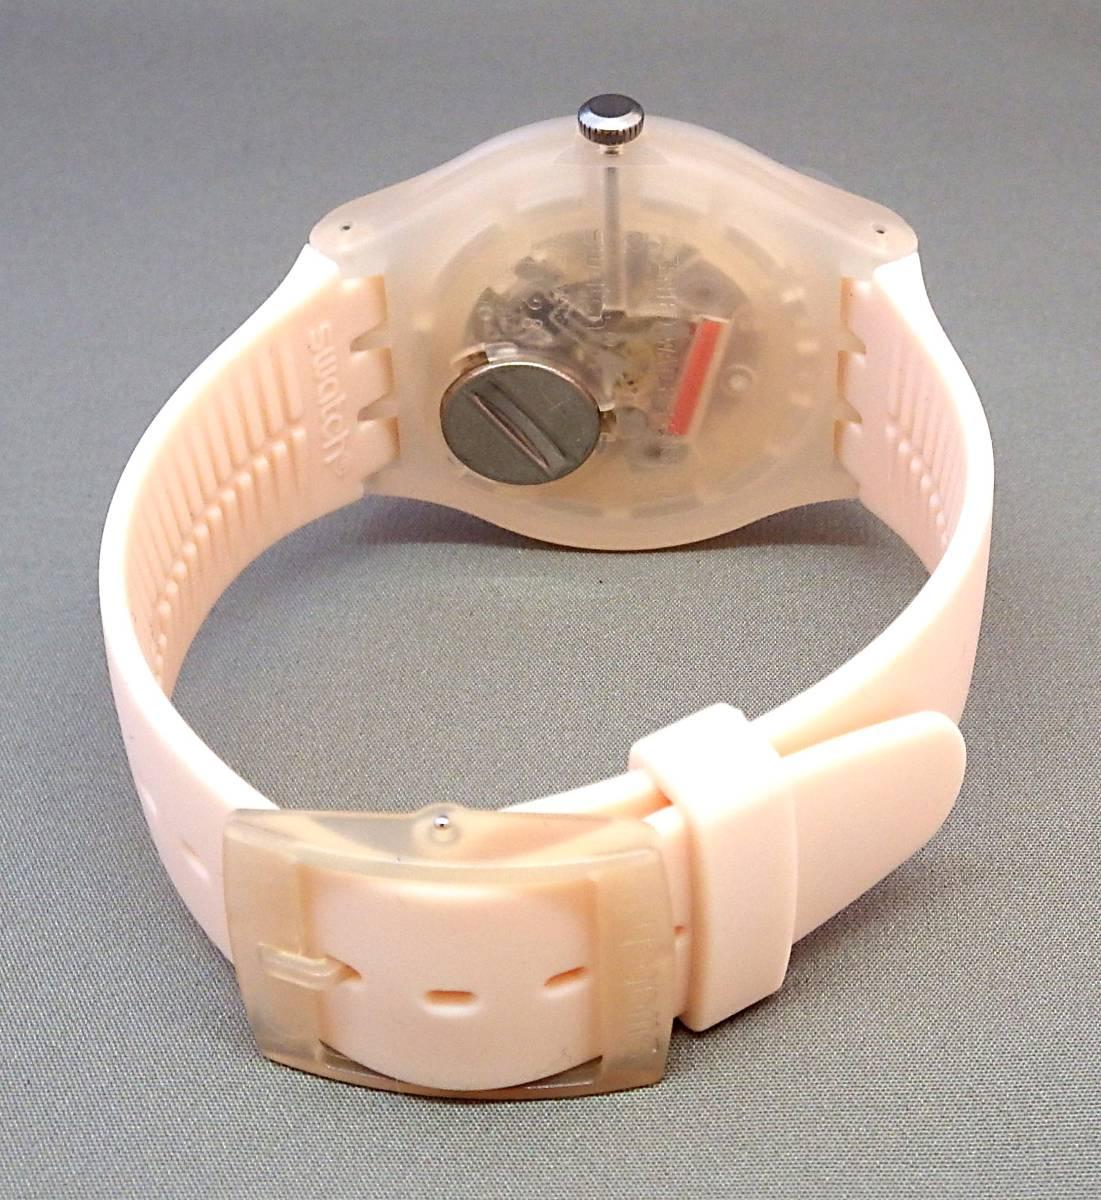 EU-9112■swatch スウォッチ SUOT700 メンズ腕時計 3針カレンダ- ケース付き 中古■切手可_画像3